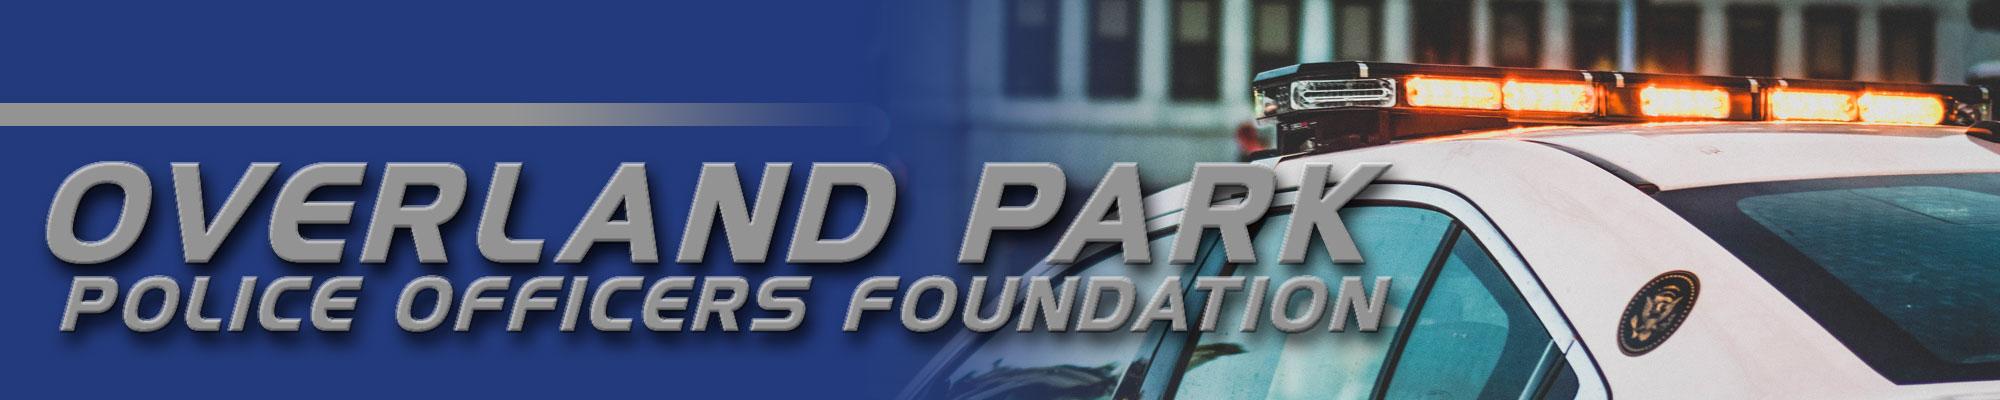 Overland Park Police Officers Foundation